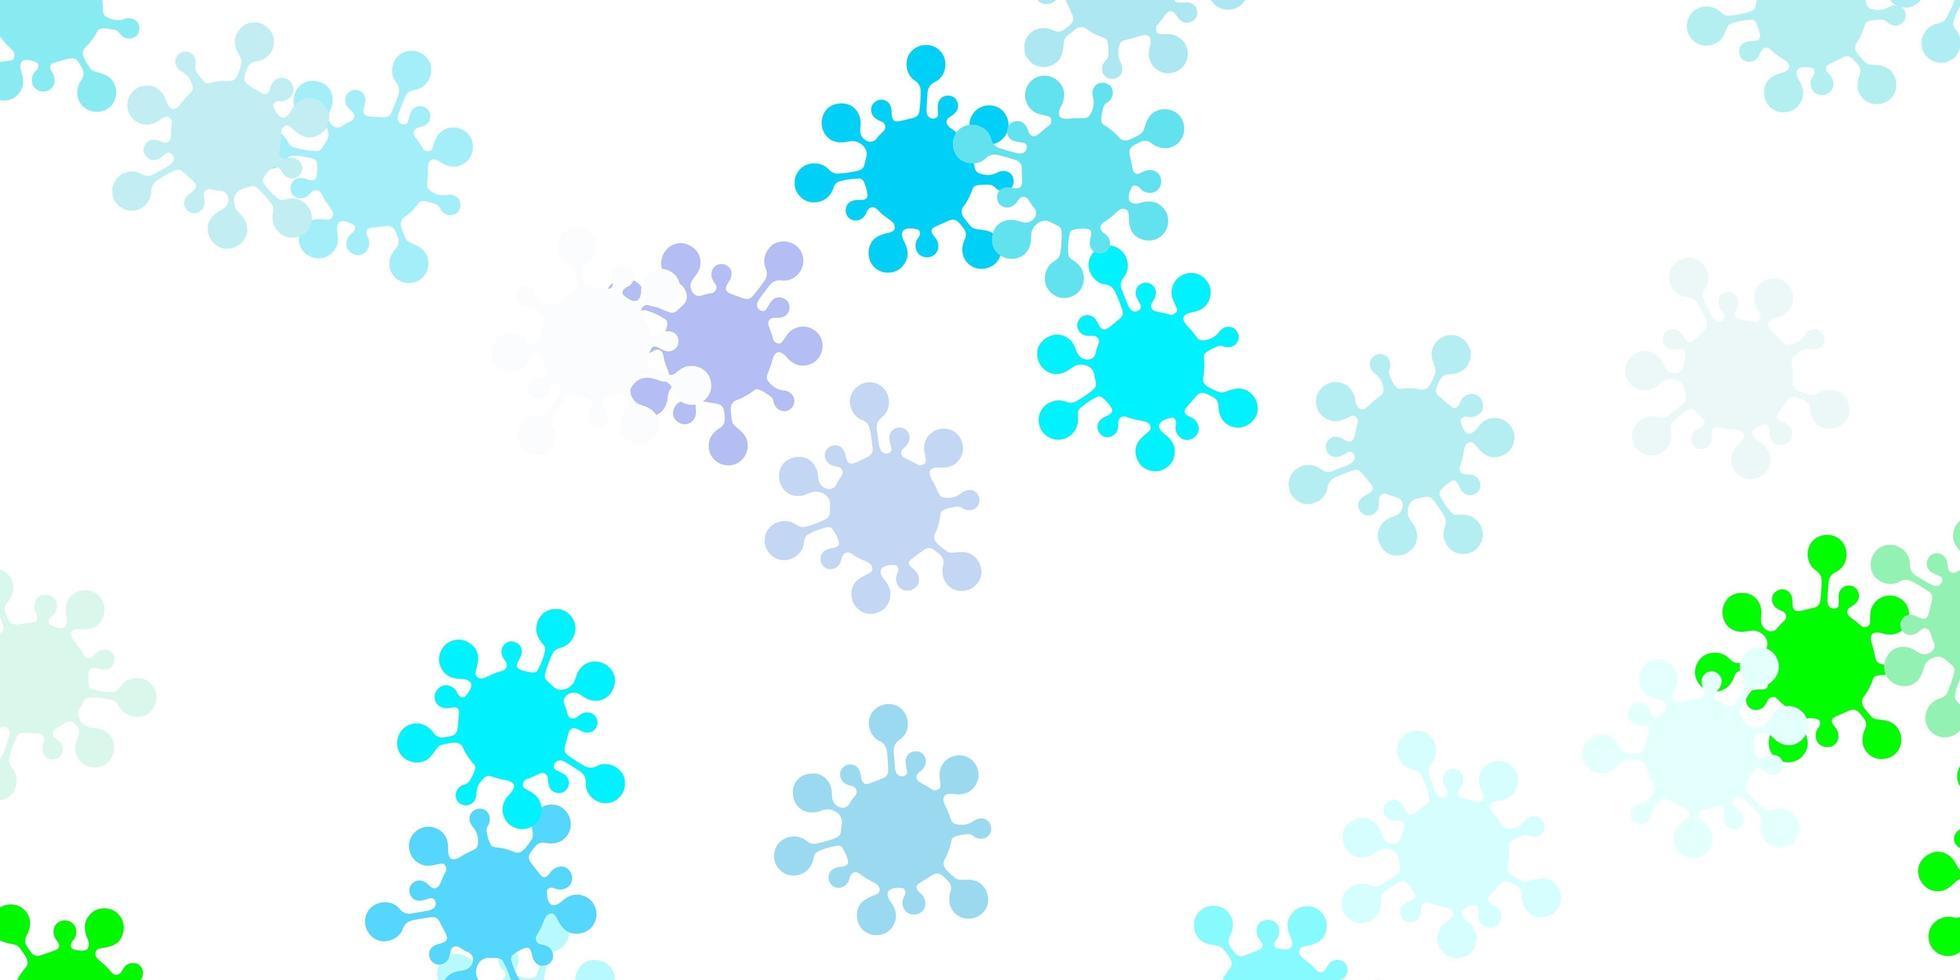 textura de vector azul claro, verde con símbolos de enfermedades.